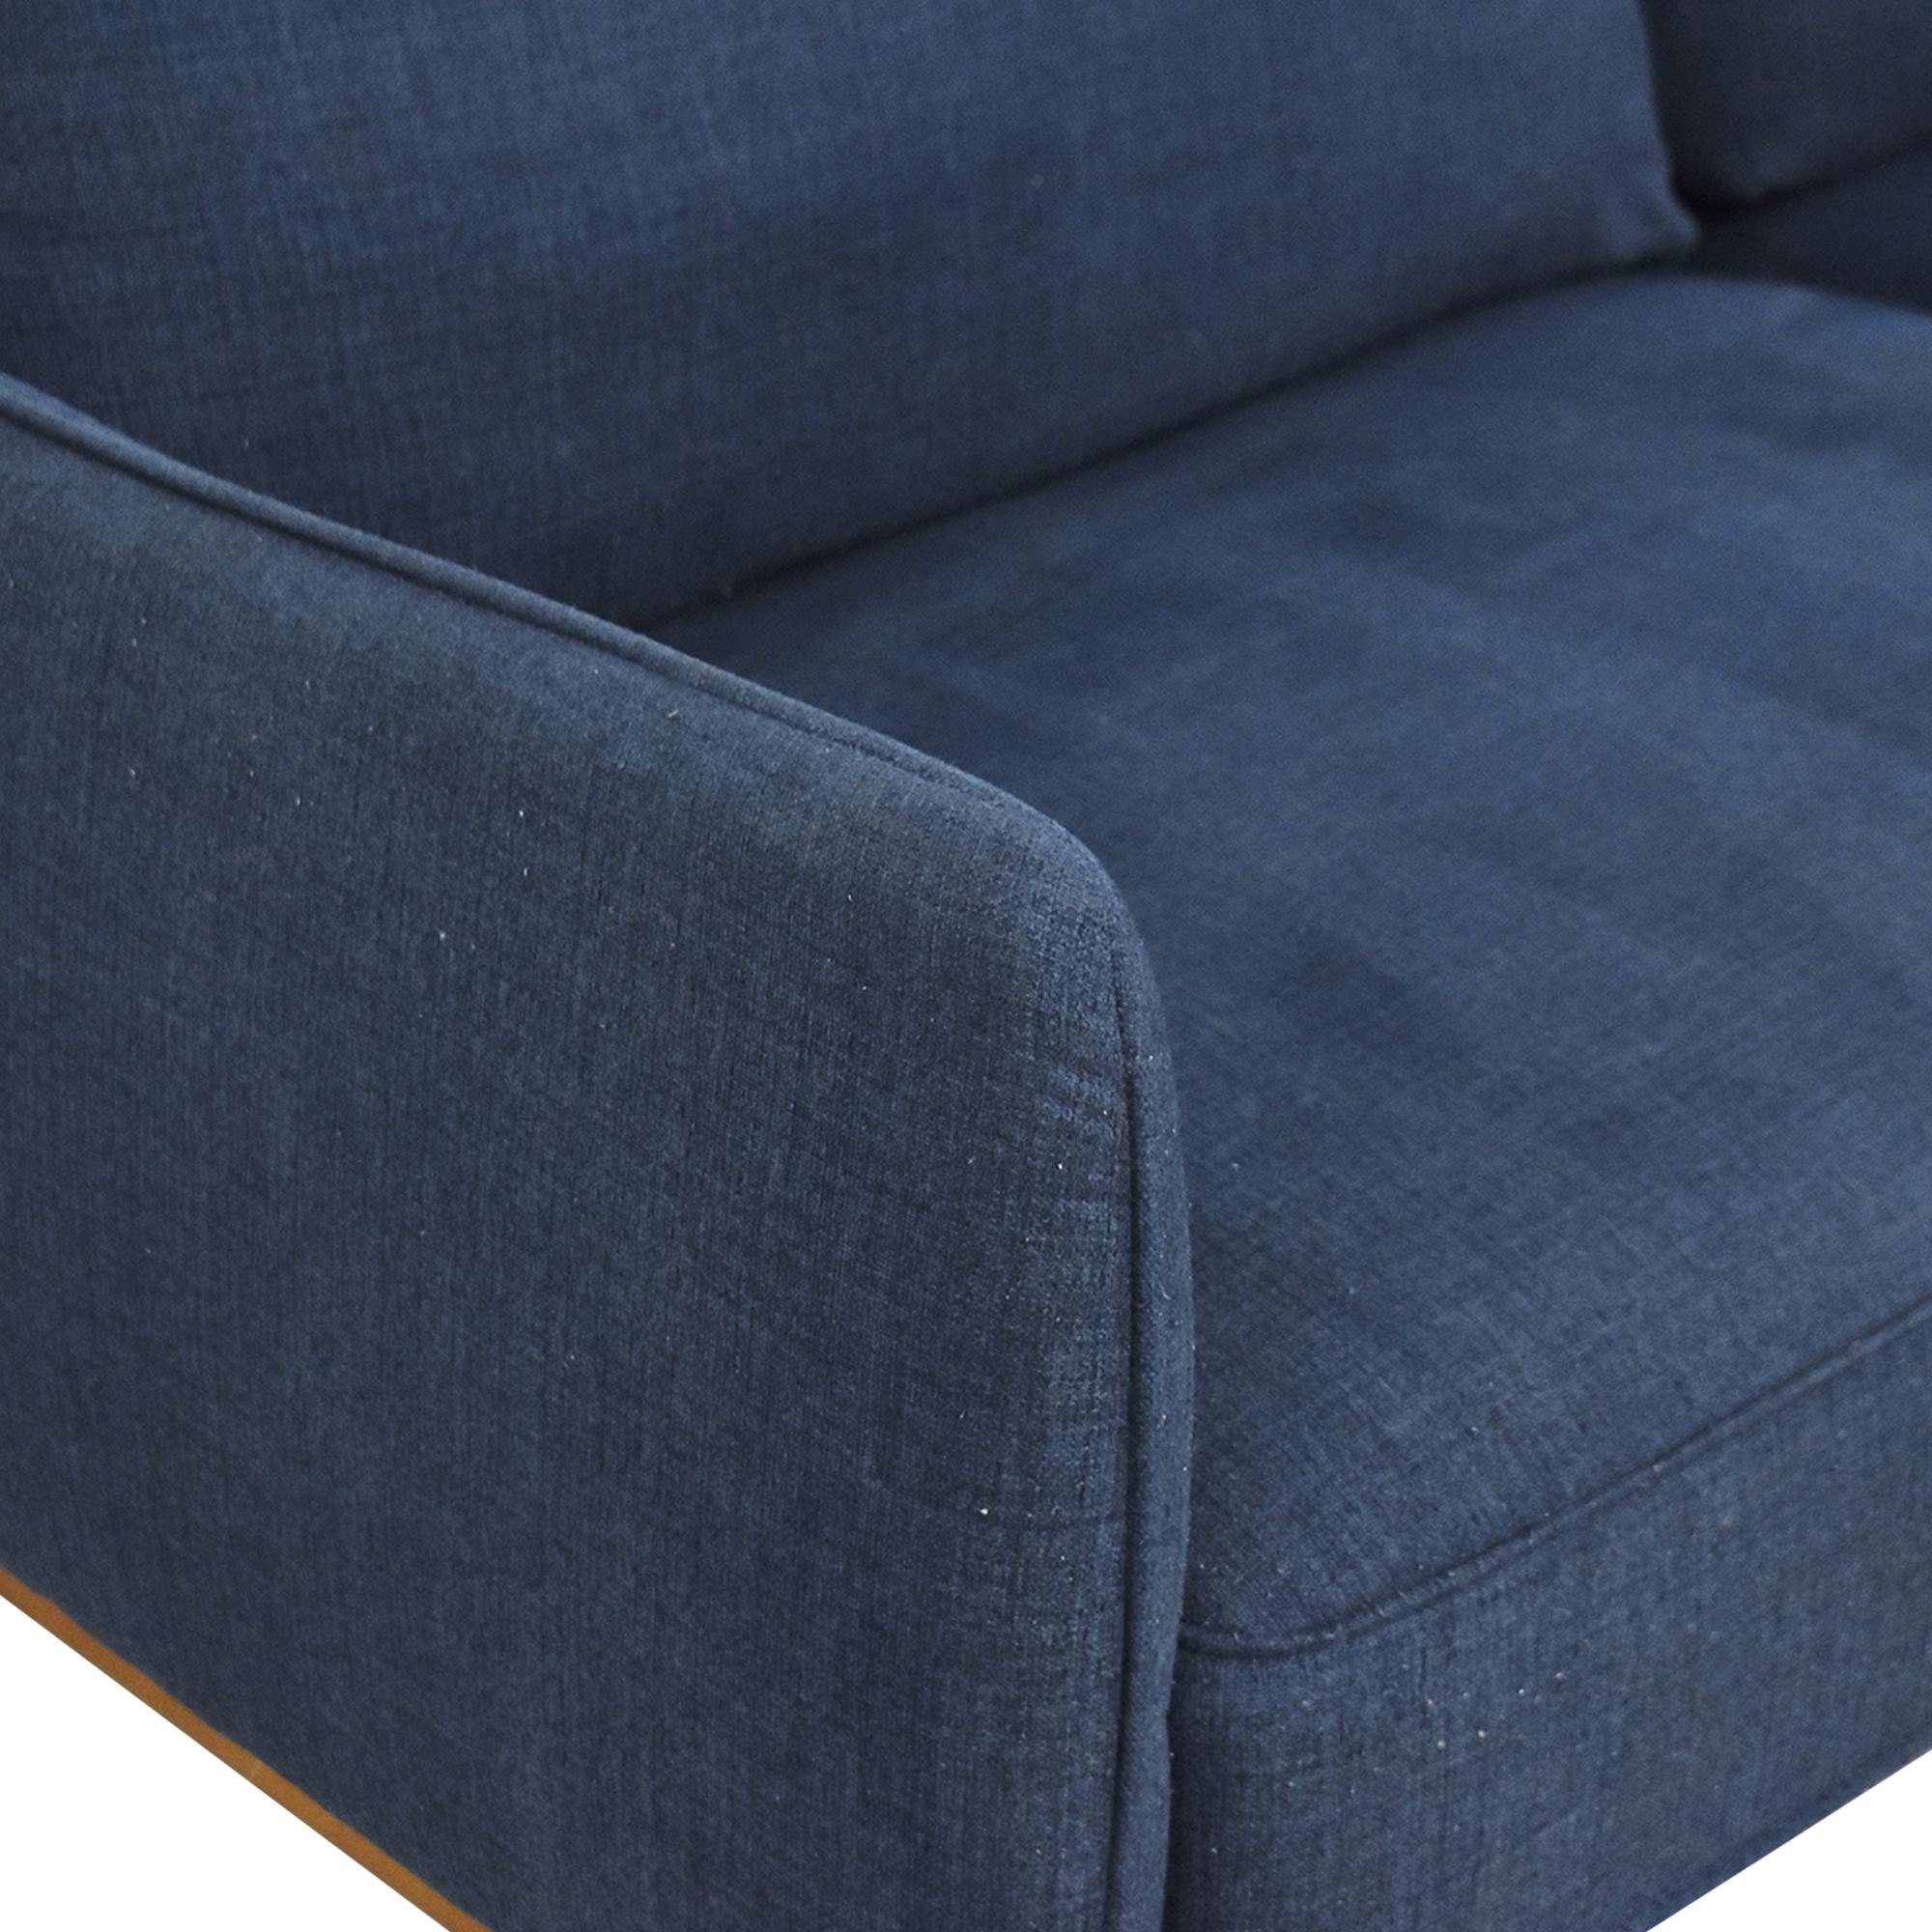 Jason Furniture Macy's Jollene Sectional Sofa coupon